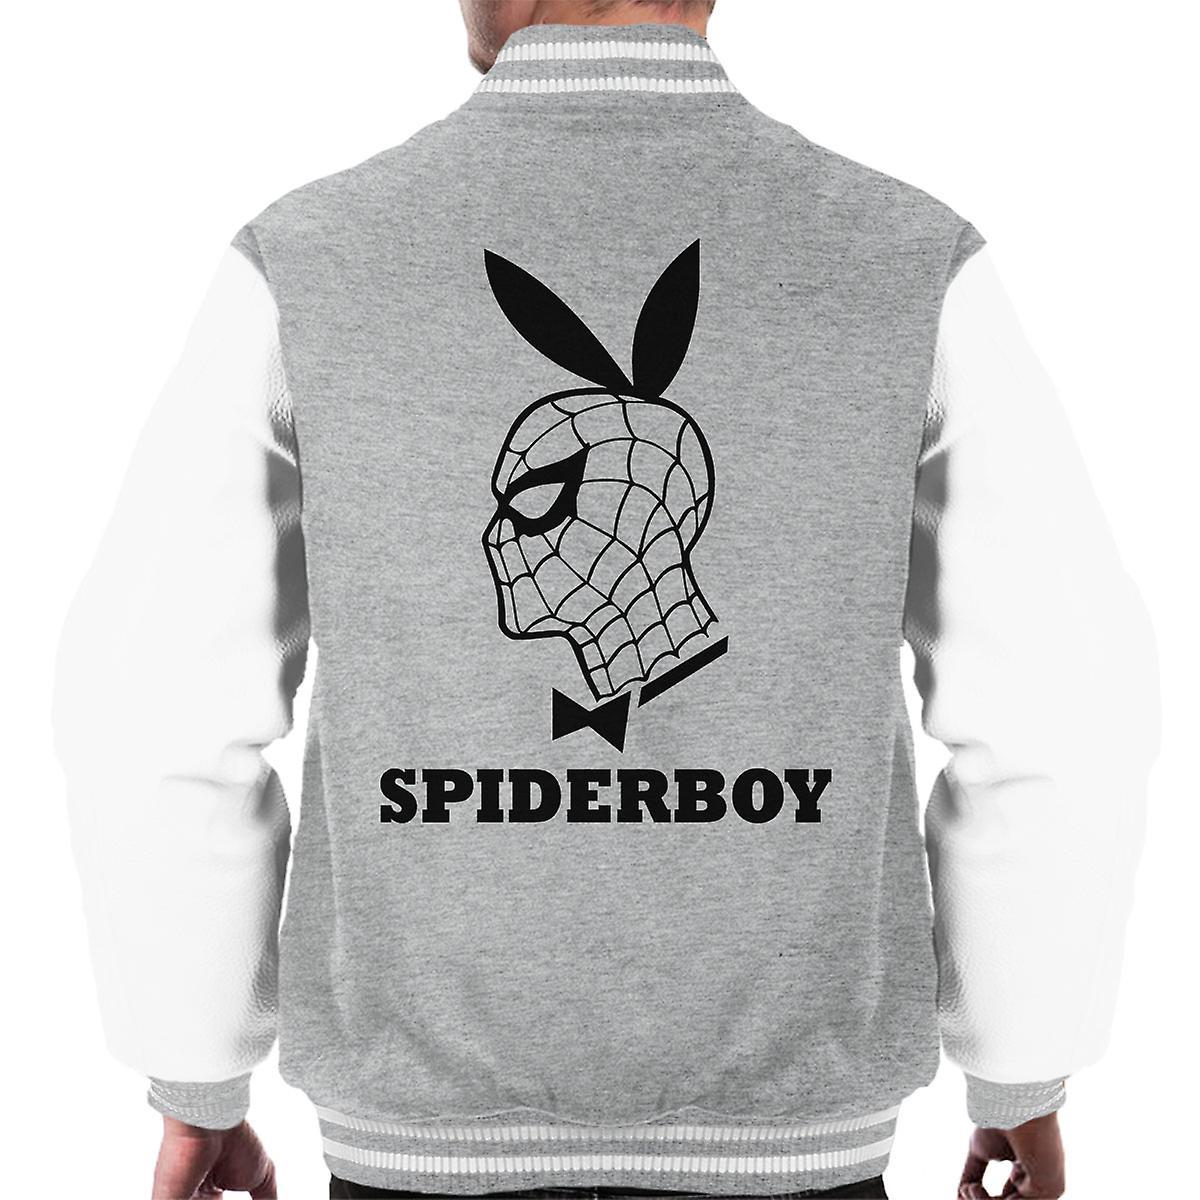 Spiderman Männer Homecoming Playboy Mashup Varsity Jacket Spiderboy c54SARj3Lq